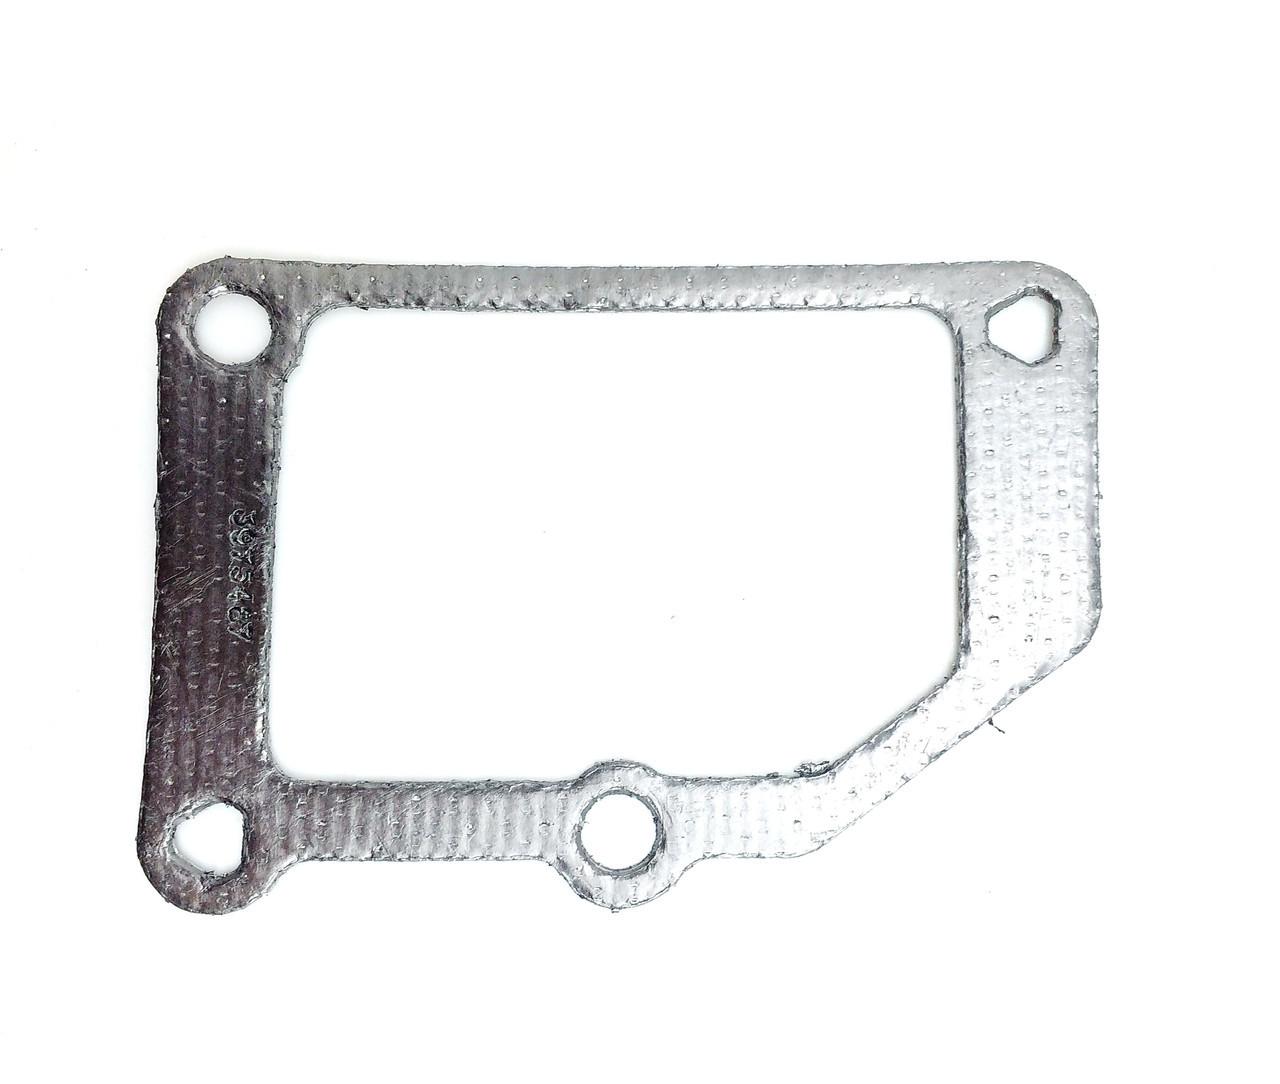 Прокладка вспомогательного устройства для запуска холодного двигателя  Cummins  ISL, QSL  3975487